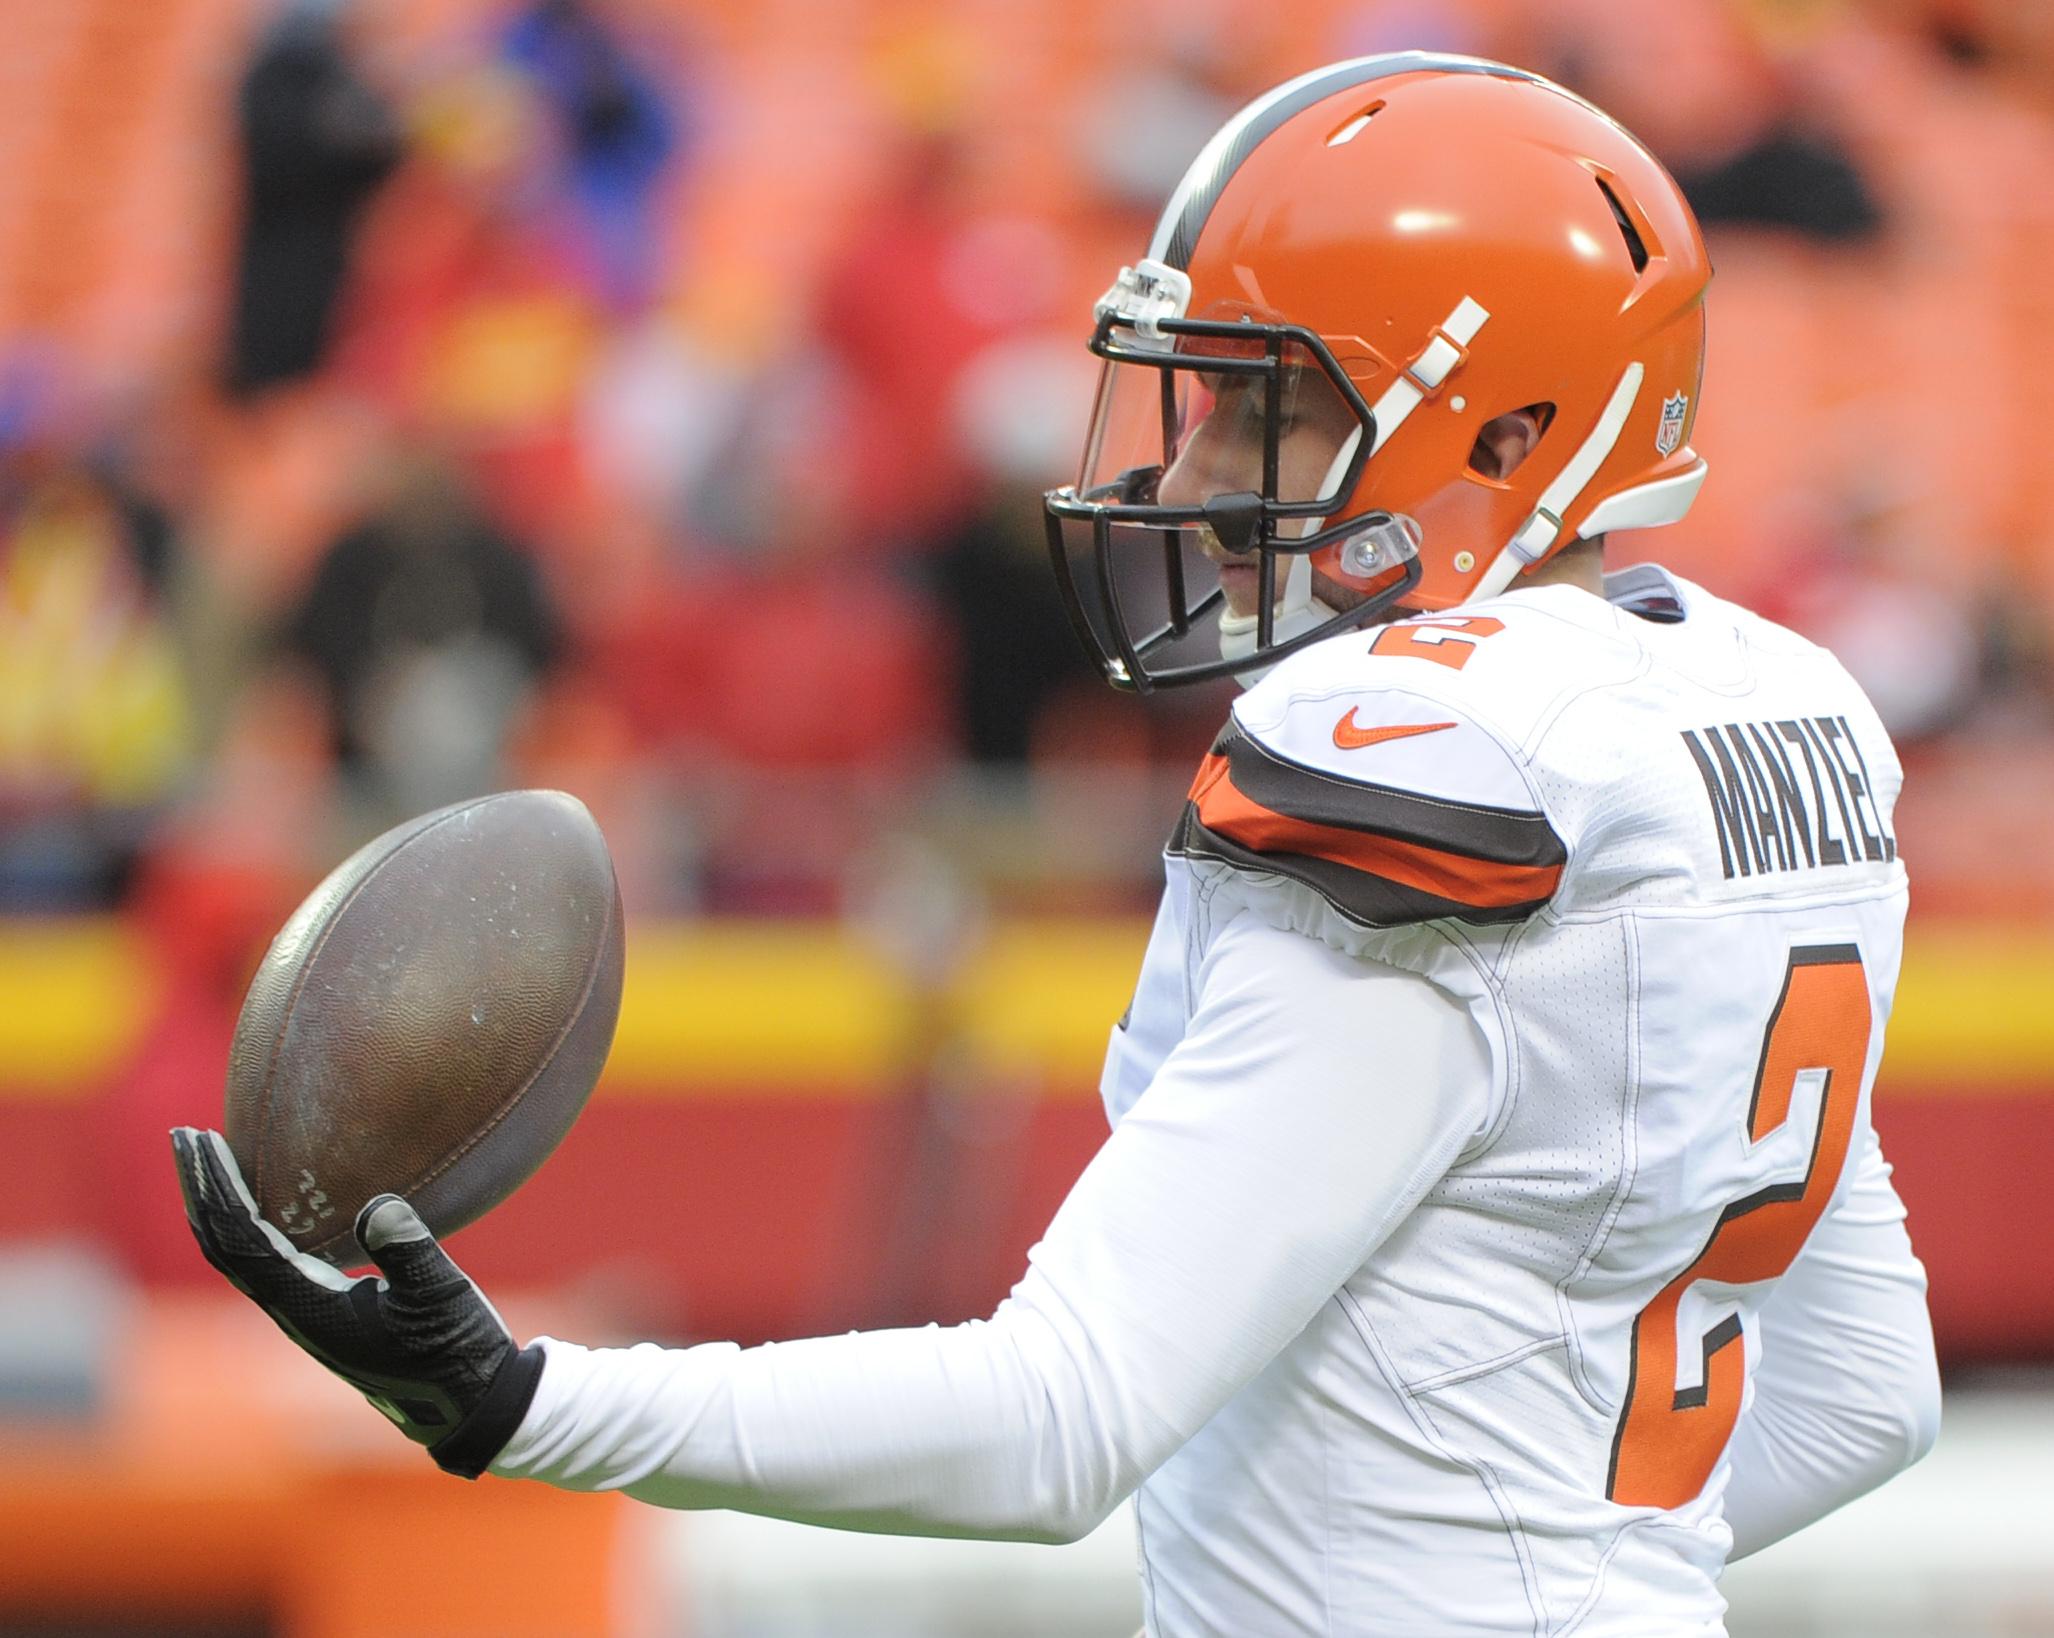 Cleveland Browns quarterback Johnny Manziel (2) balances a football before an NFL football game against the Kansas City Chiefs in Kansas City, Mo., Sunday, Dec. 27, 2015. (AP Photo/Ed Zurga)